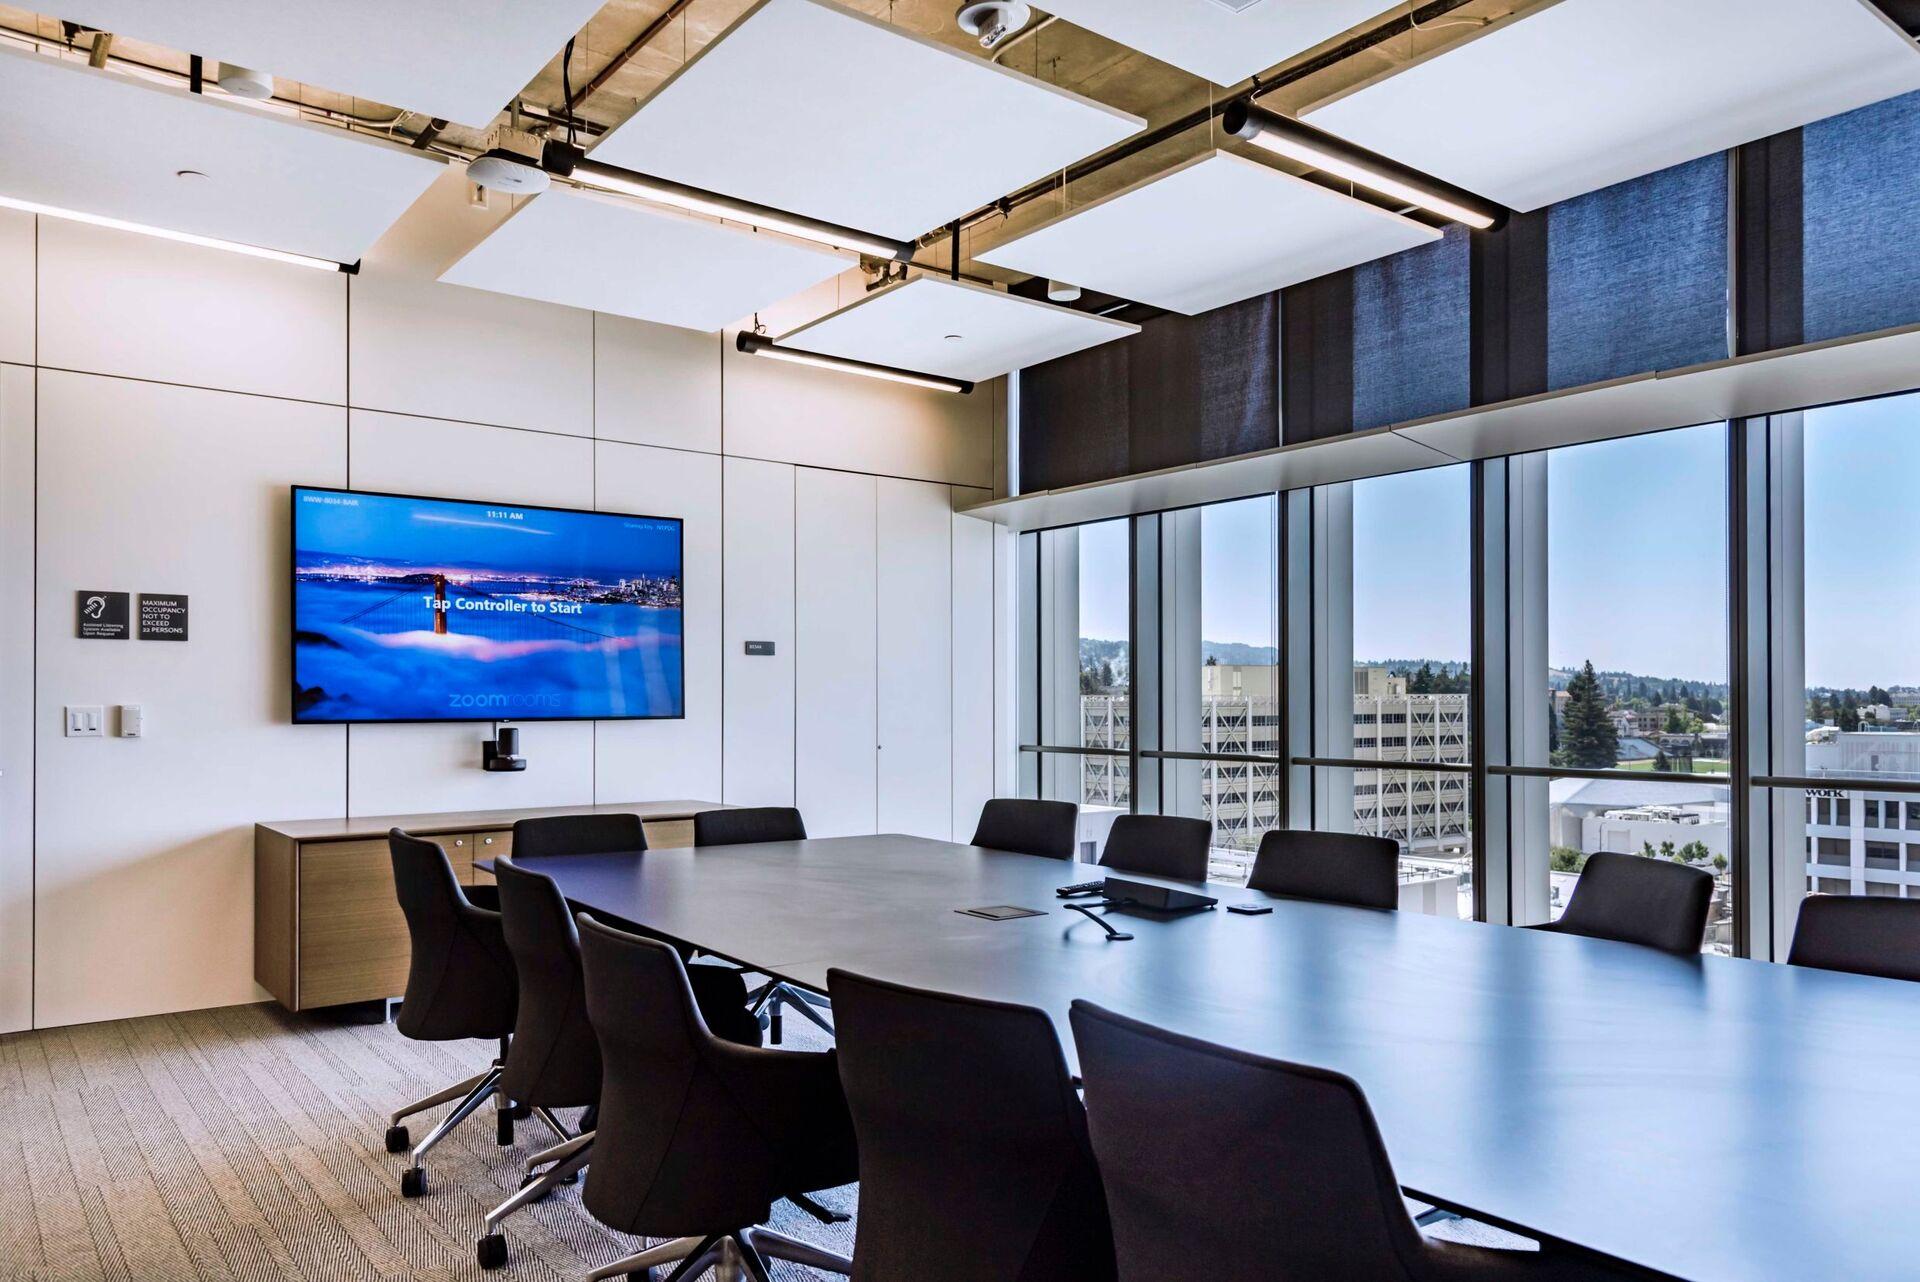 Berkeley Artificial Intelligence Research Lab photo showing a meeting room built using DIRTT custom modular interior solutions.